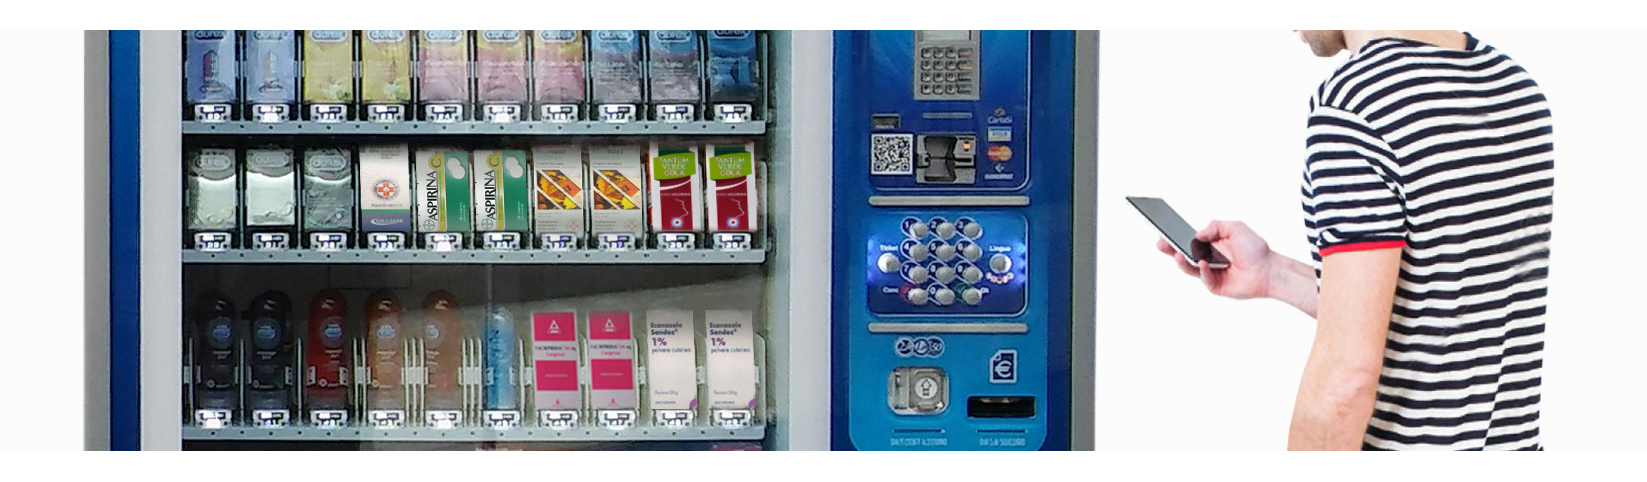 MICROHARD Sistema Distribuzione Automatica OTC